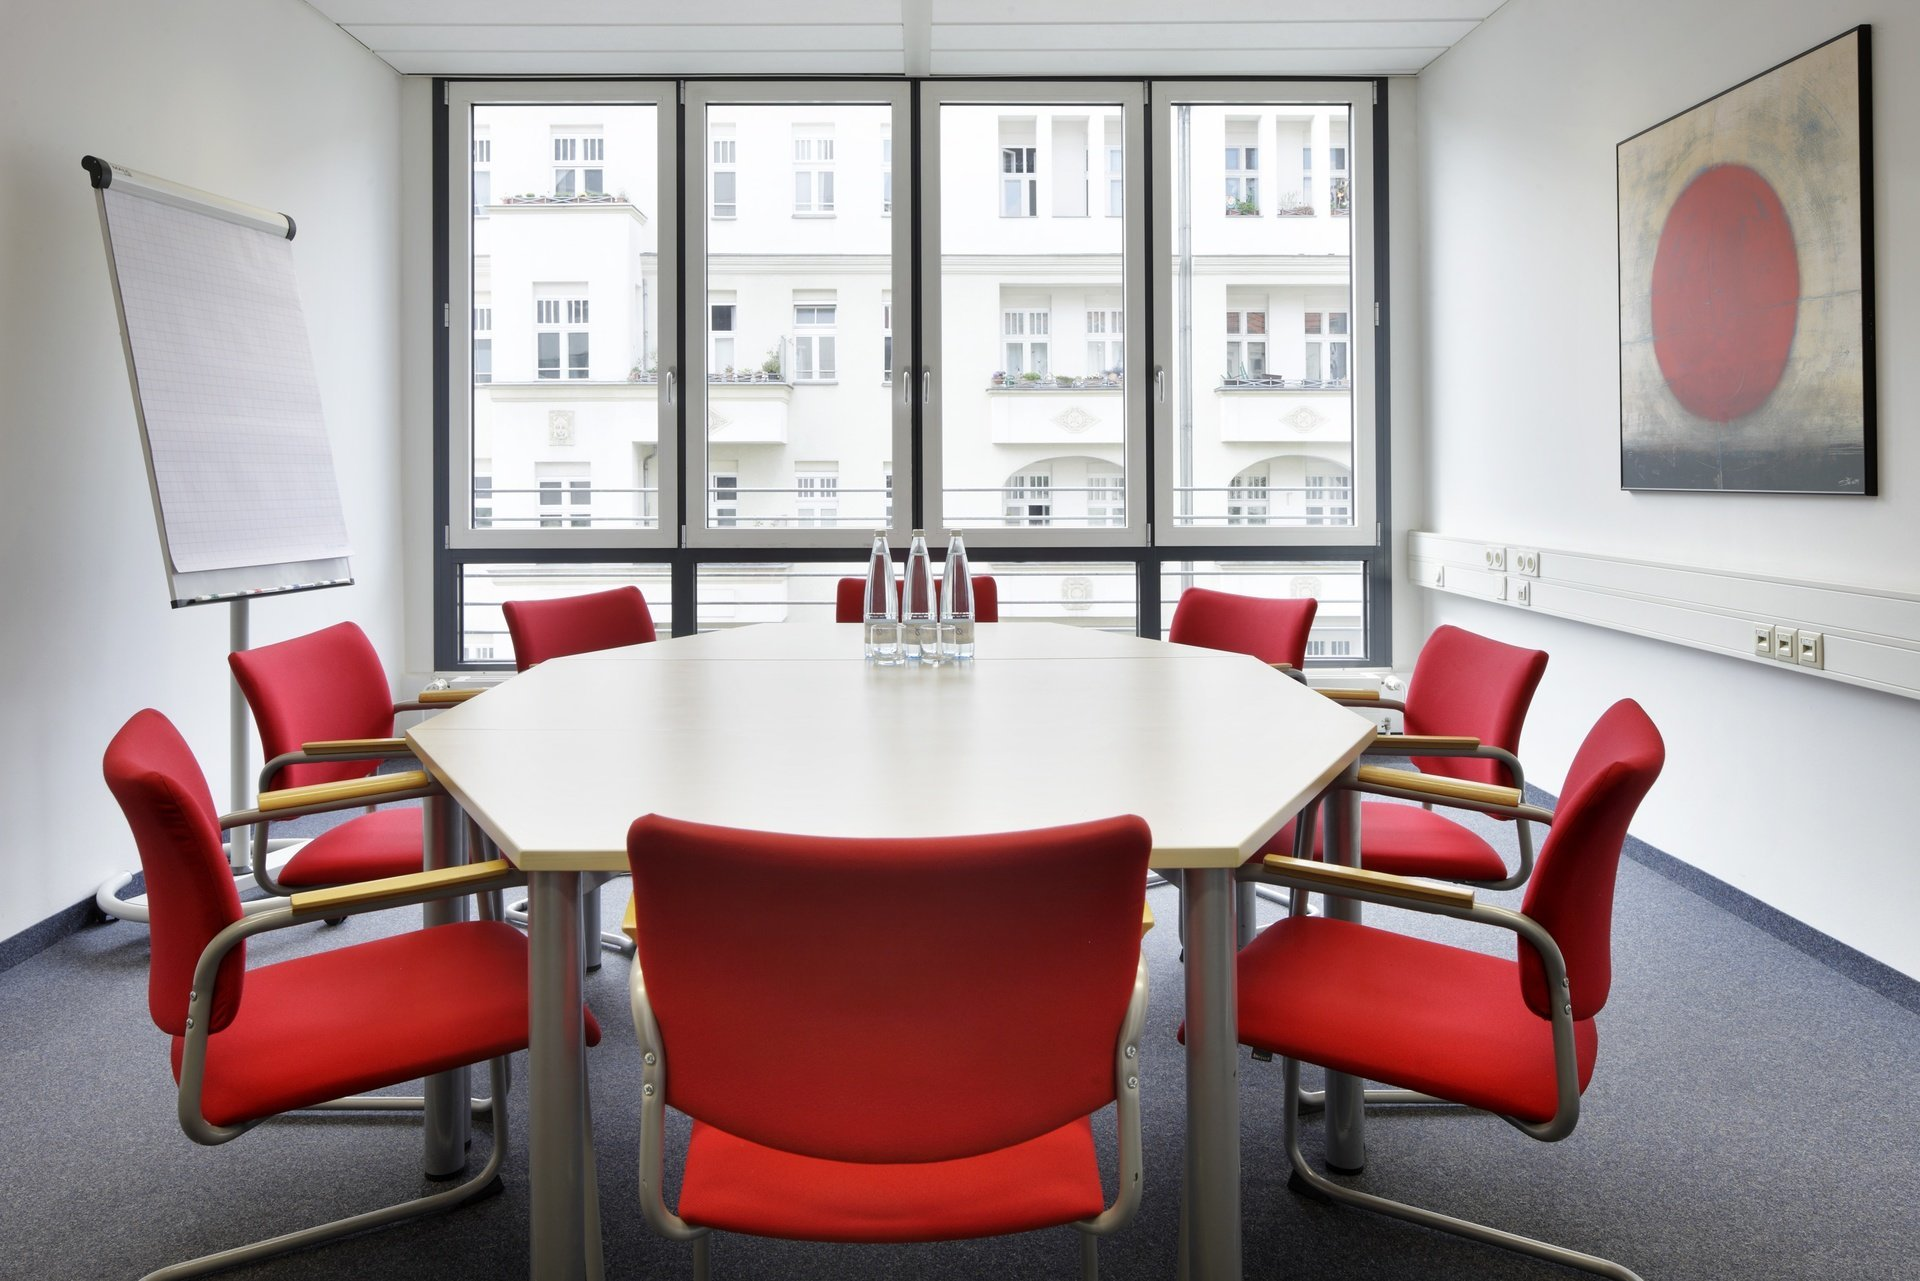 Berlin conference rooms Meetingraum IFM Institut für Managementberatung GmbH image 0